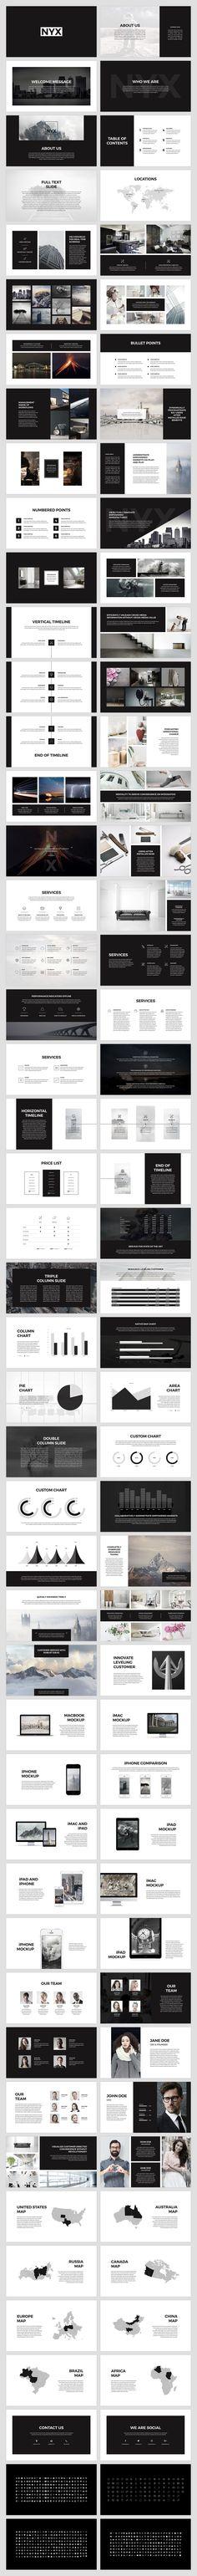 Greek powerpoint template pinterest greek template and layouts nyx presentation template by slidestation on creativemarket toneelgroepblik Images